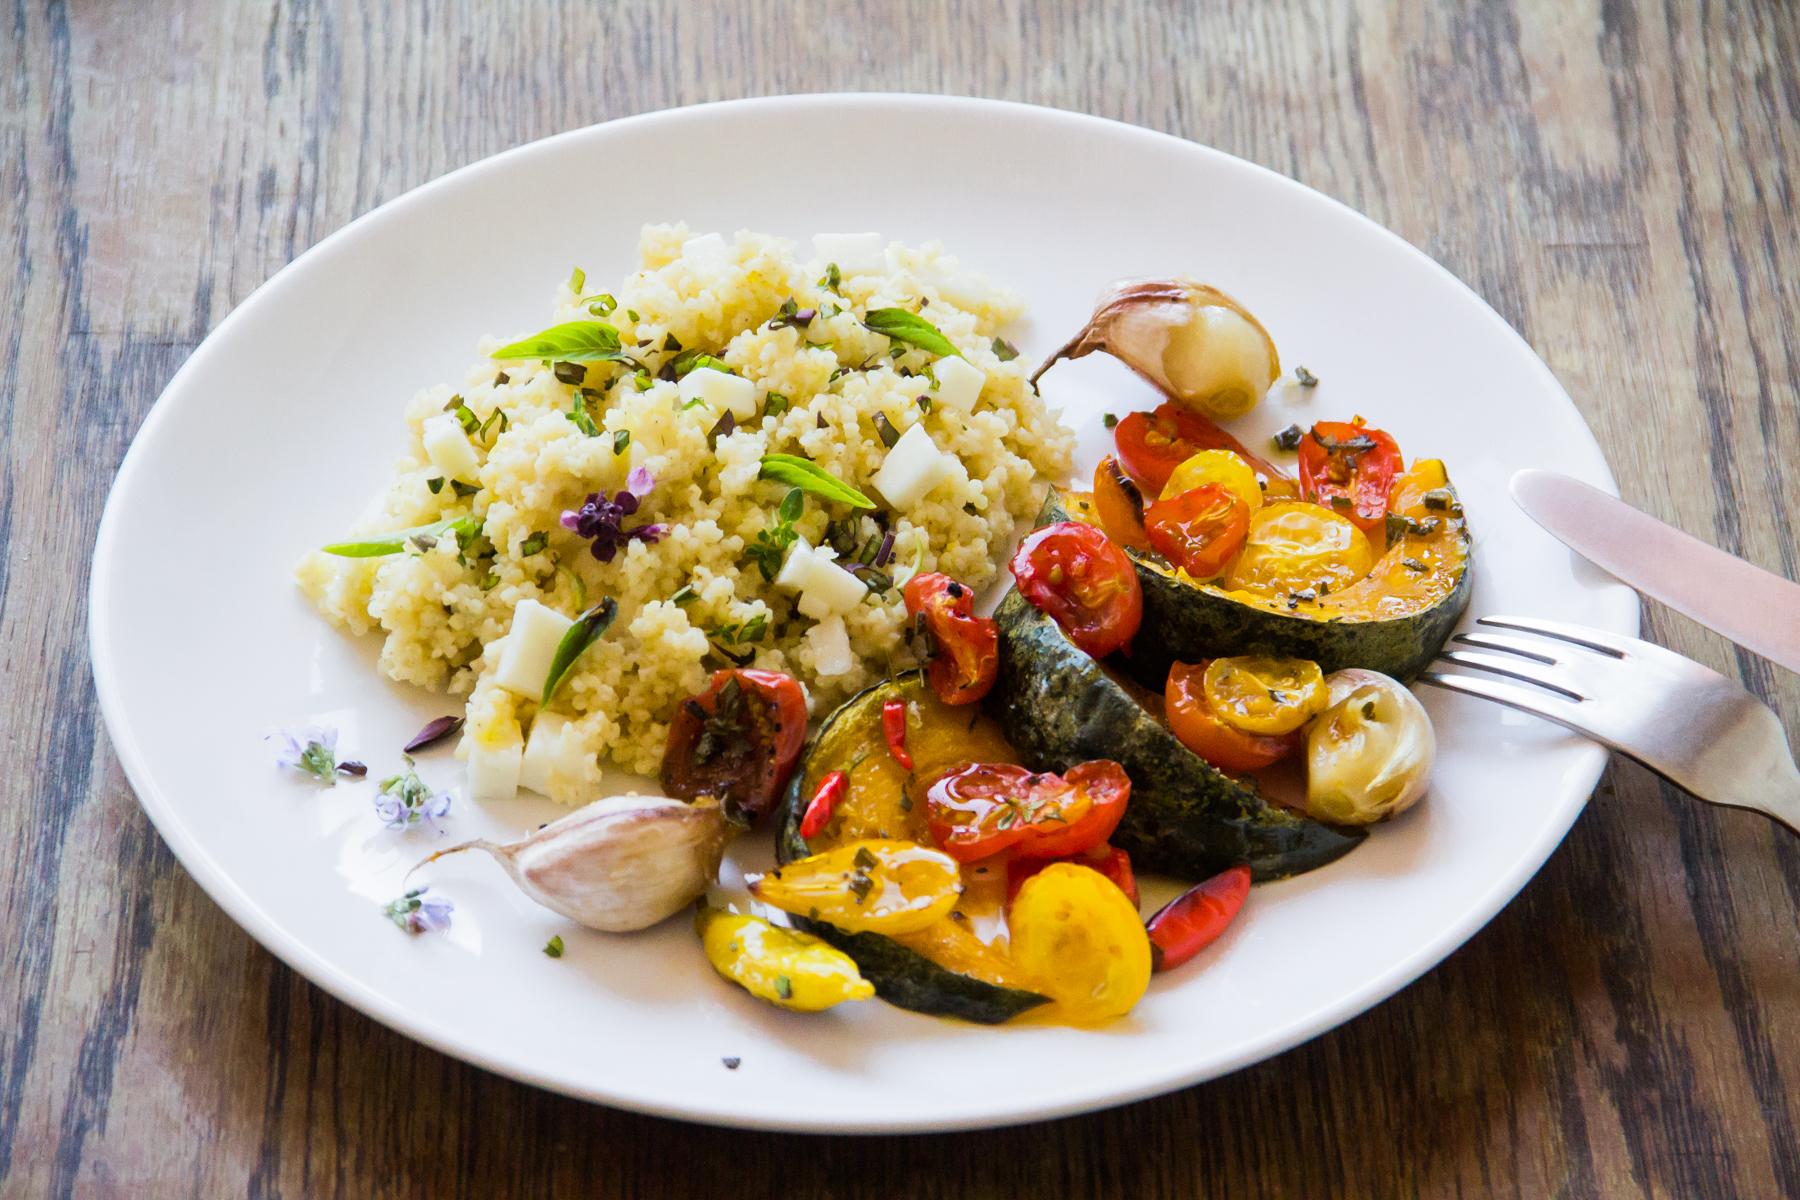 Pečená zelenina s jáhly a kozím sýrem